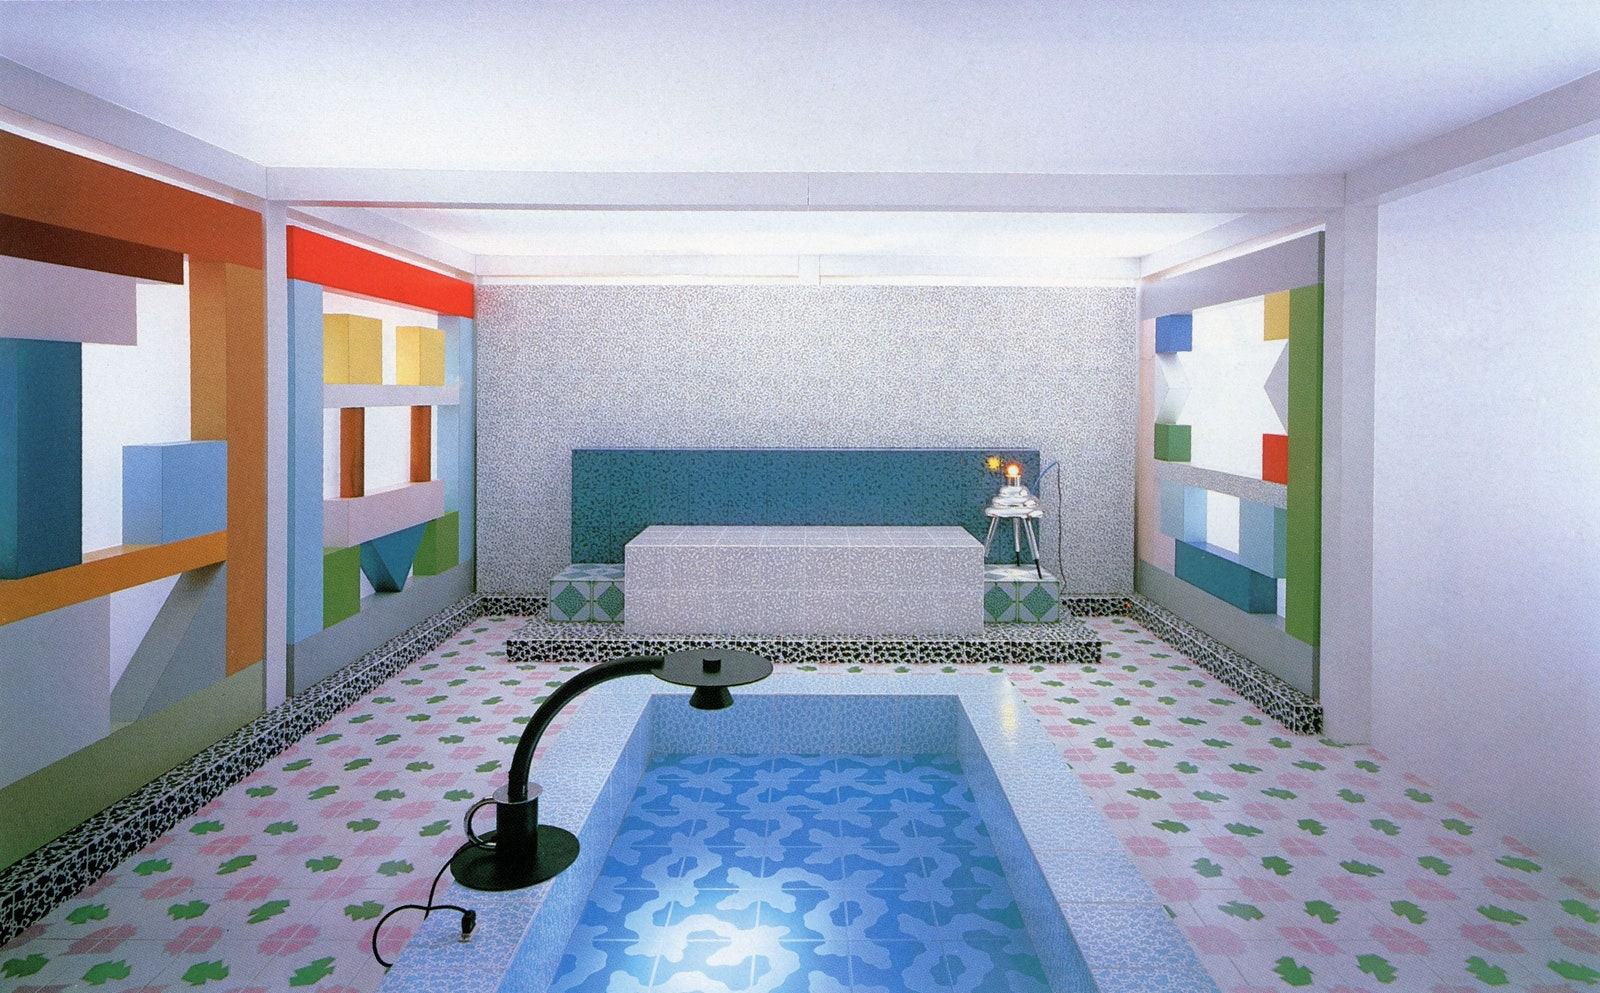 Sottsass Associati Interior for an exhibition on Italian Design in Tokyo 1984  Photo Marirosa Ballo  VG BildKunst Bonn...